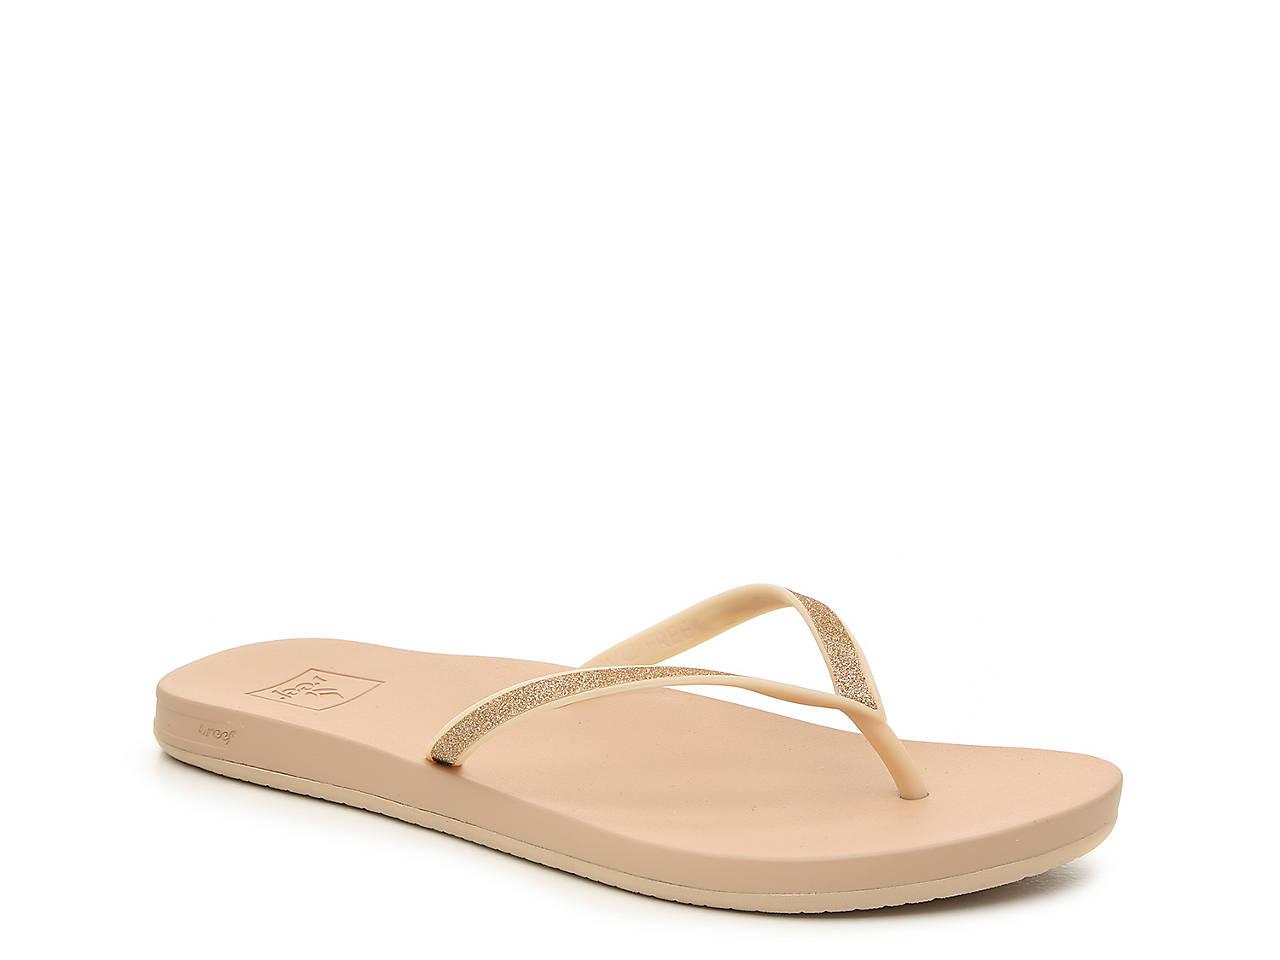 a32869443df2 Reef Cushion Bounce Stargazer Flip Flop Women s Shoes